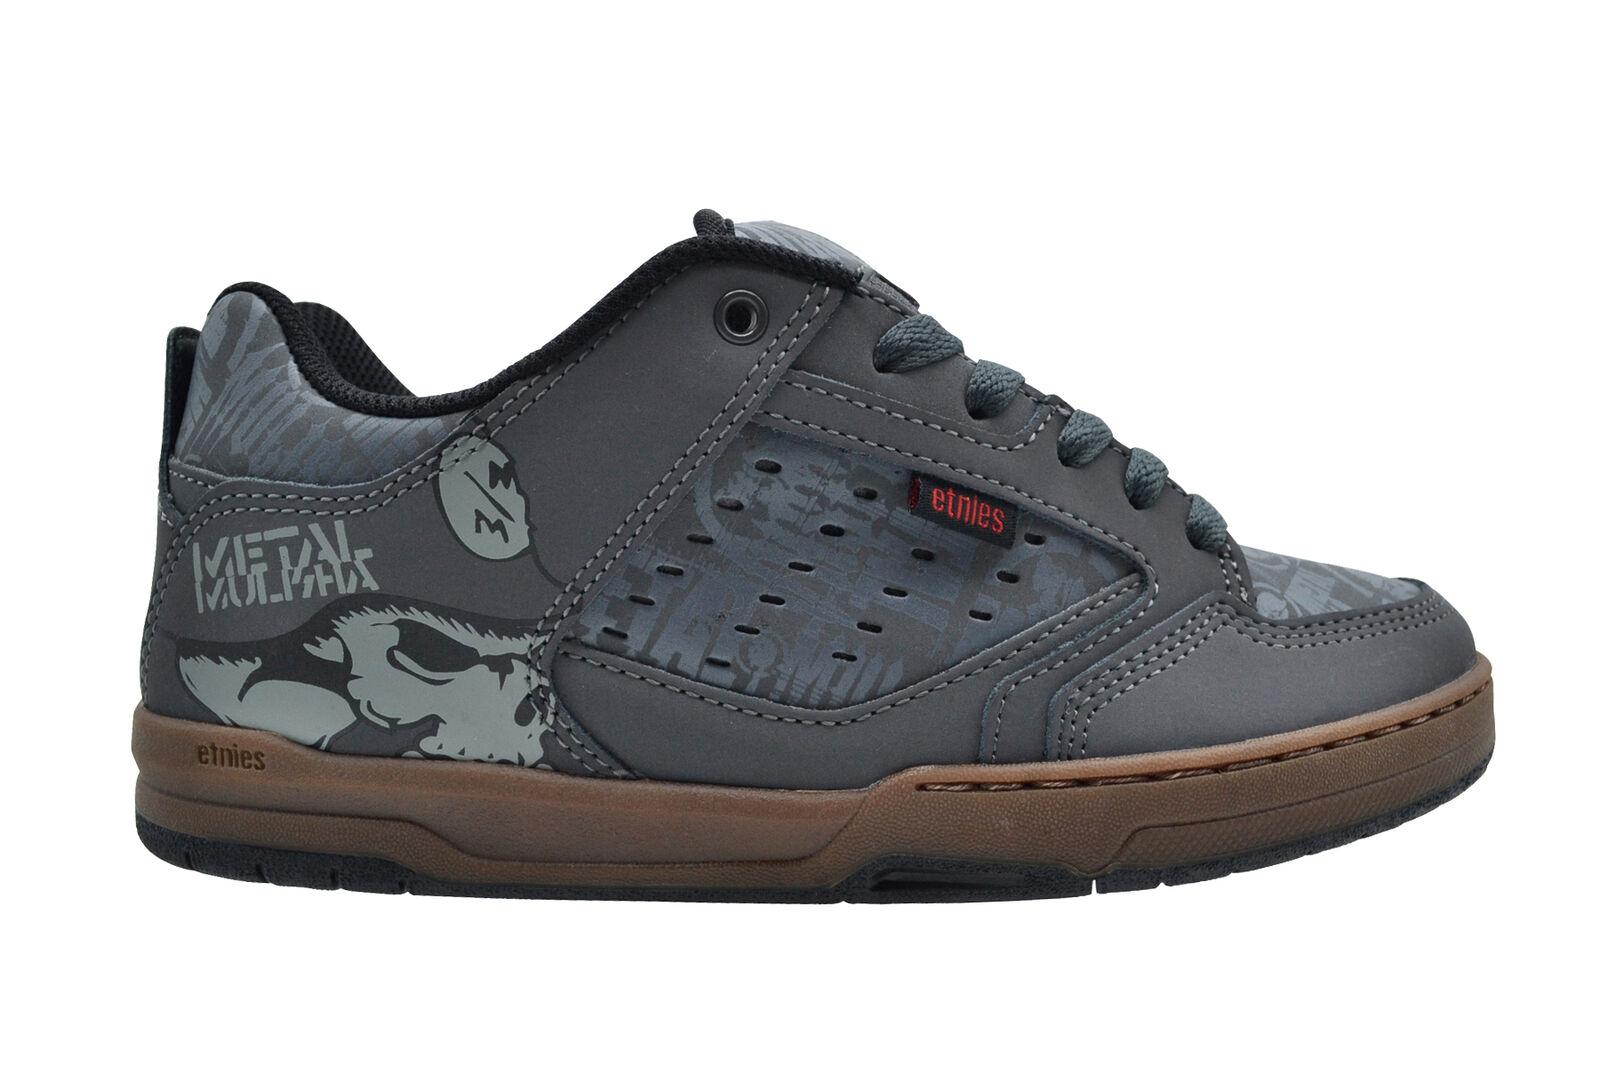 Etnies metal Mulisha cartel gris Gum zapatos zapatillas gris